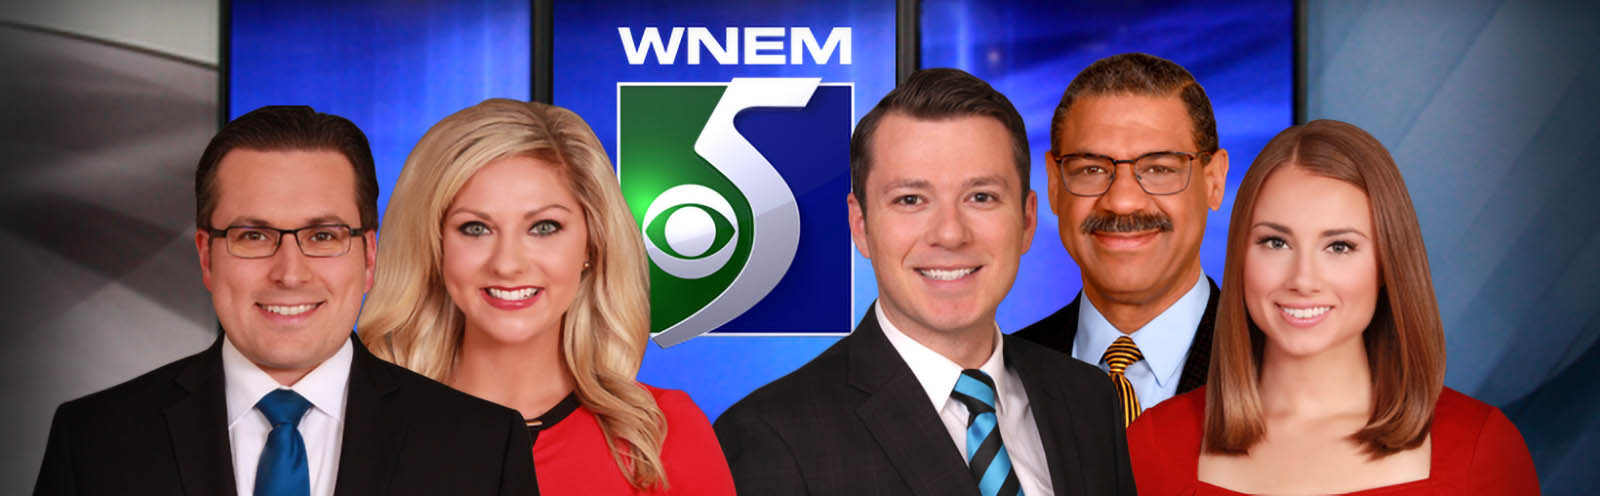 WNEM TV5 News Anchors